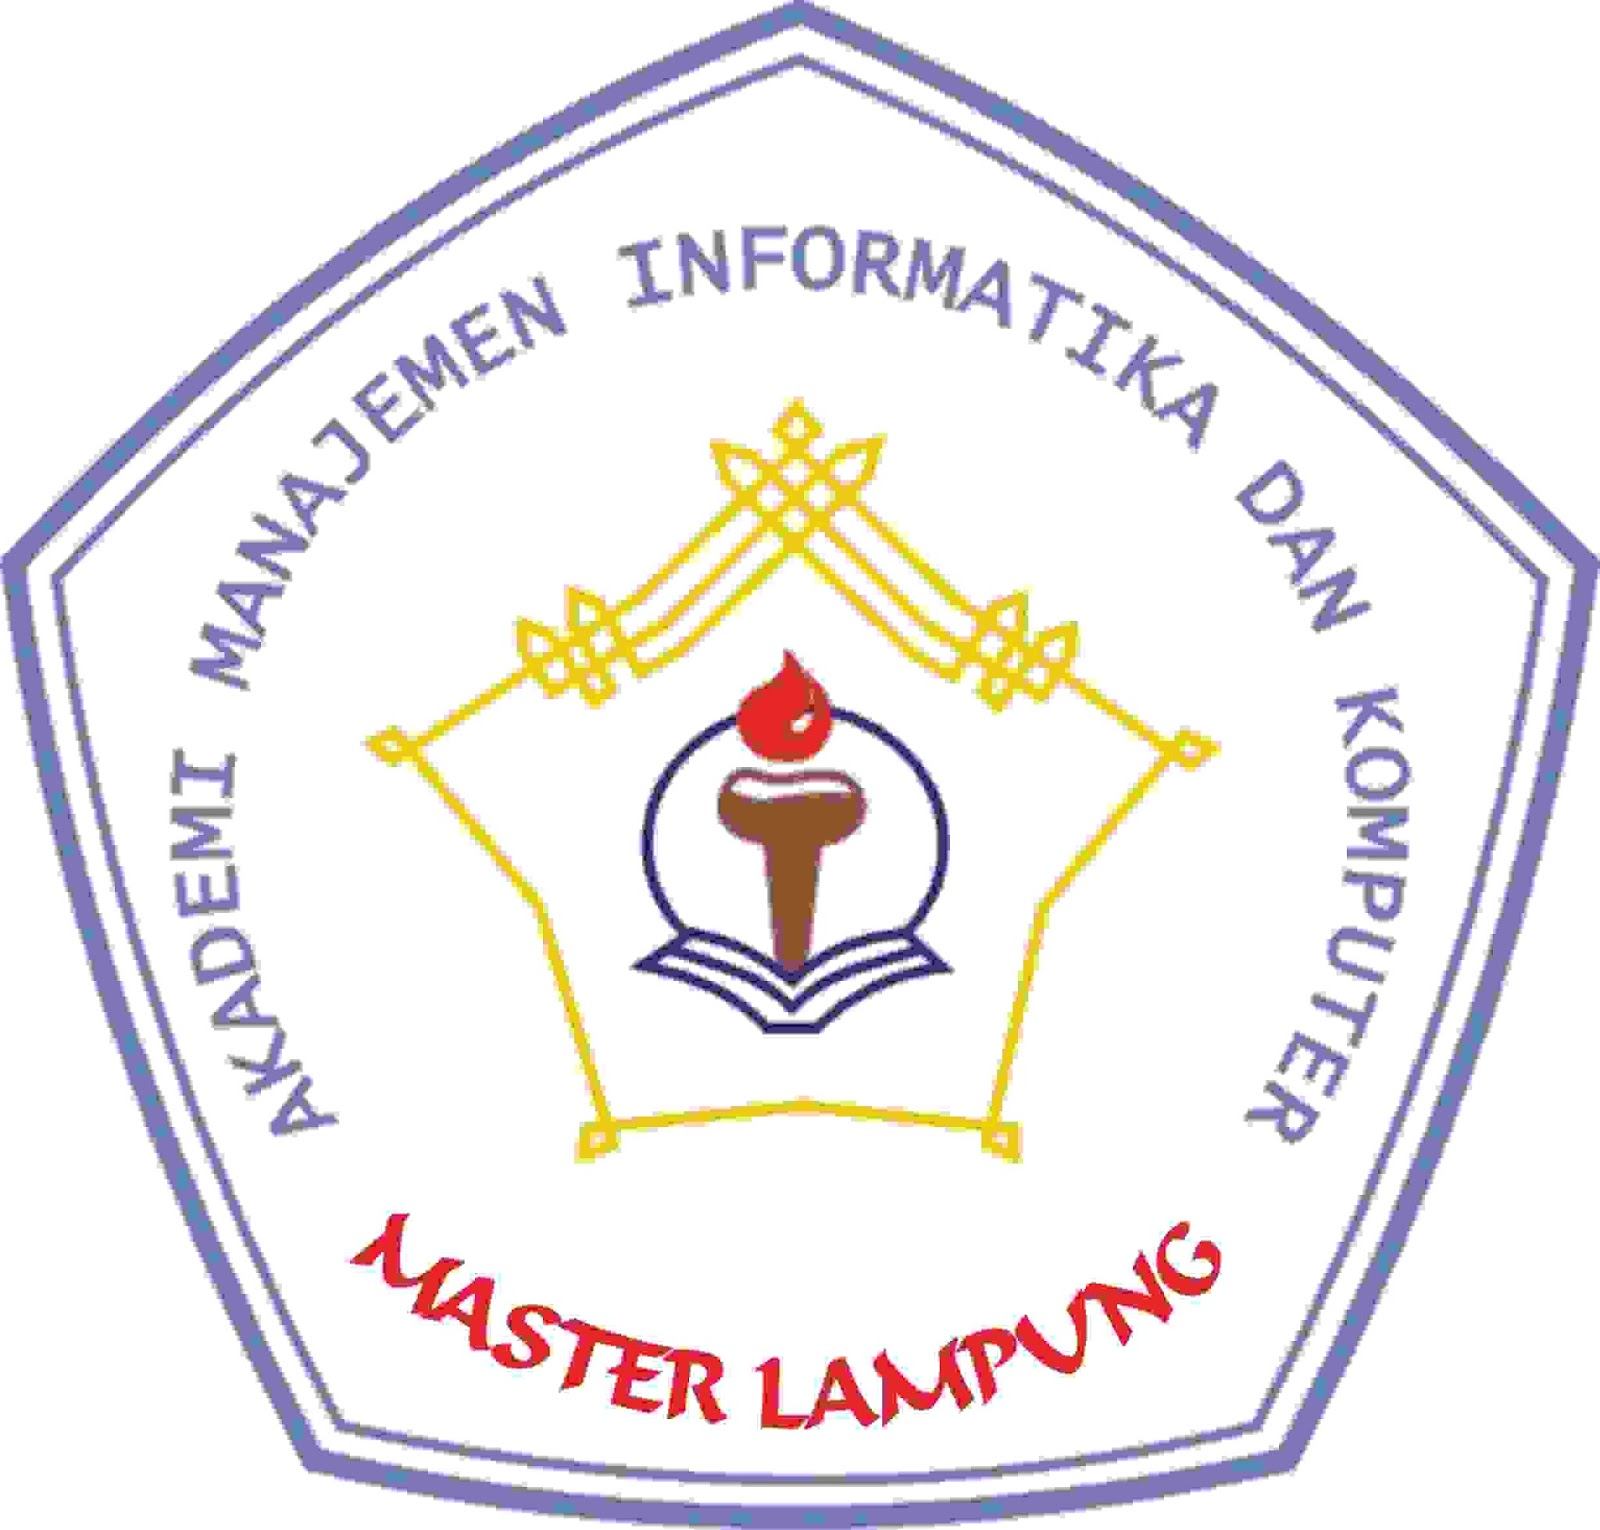 Akademi Manajemen Informatika dan Komputer (AMIK) Master